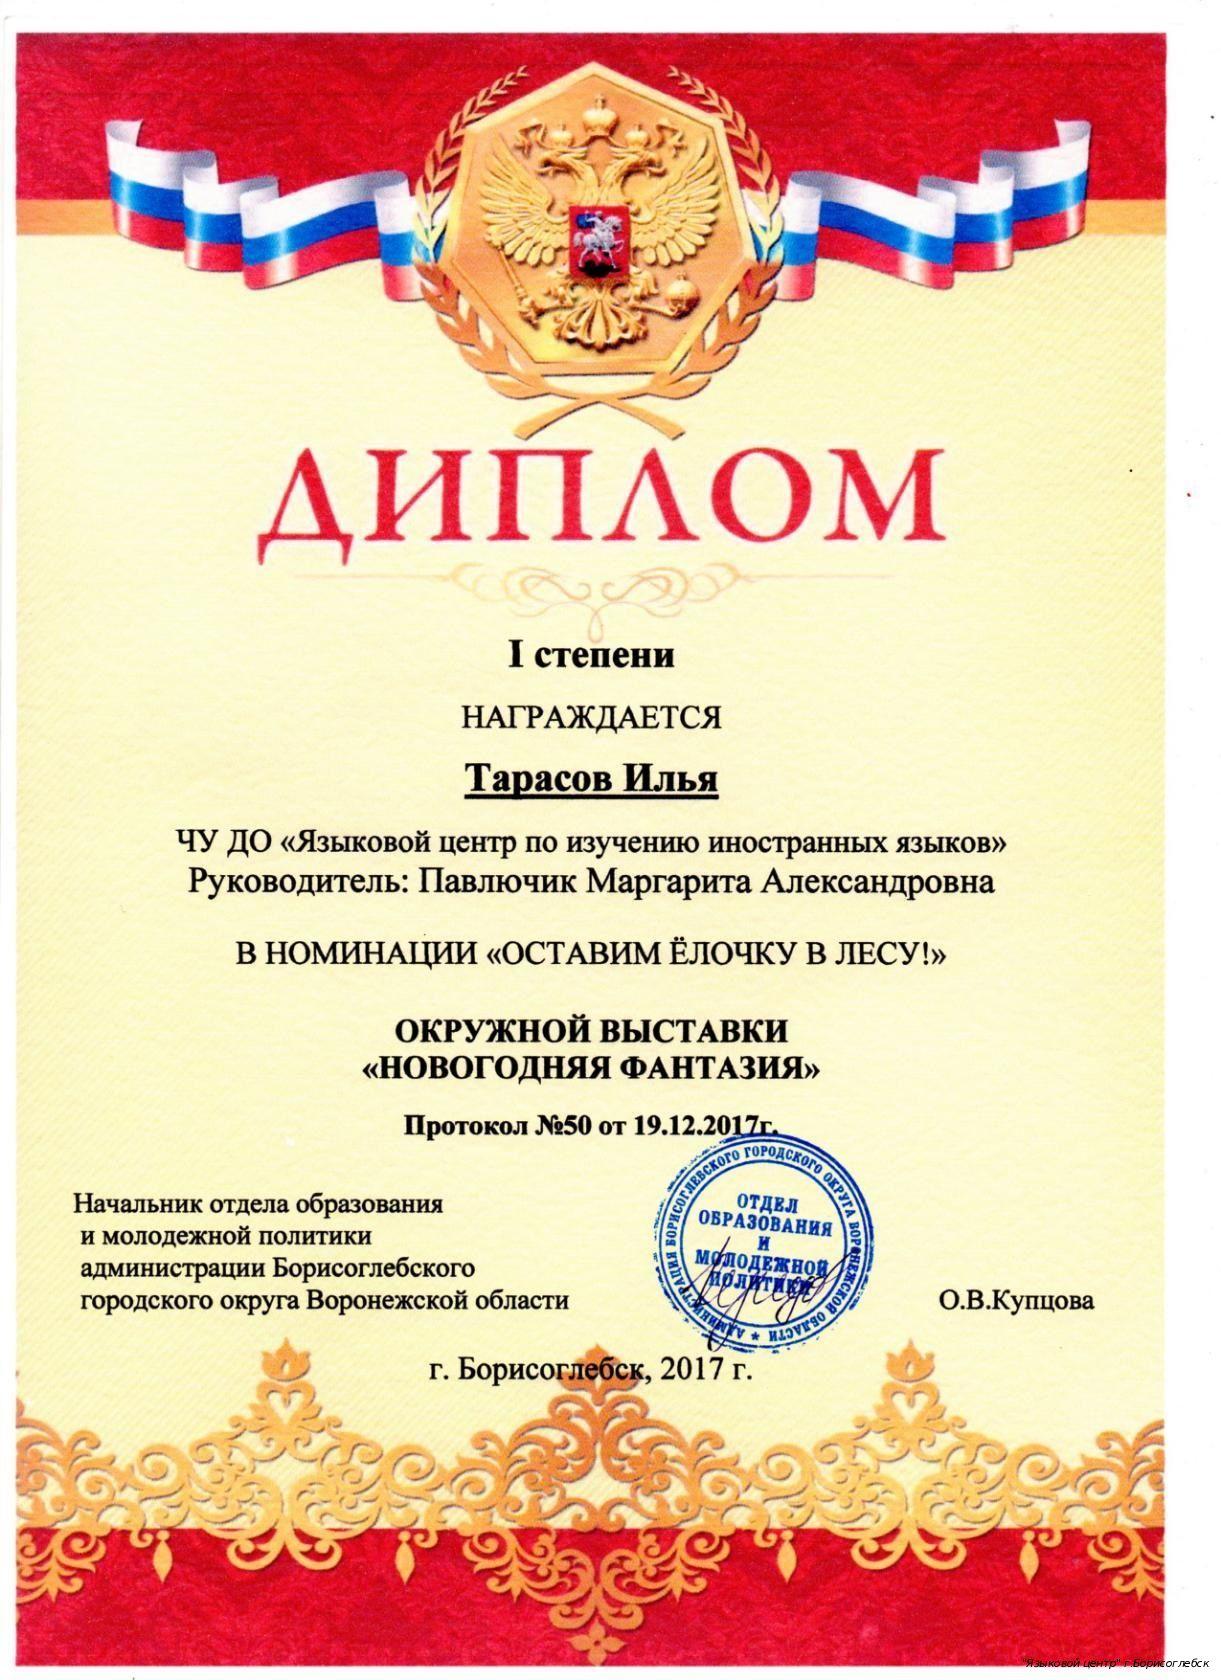 diplom_tarasov_ilja.jpg